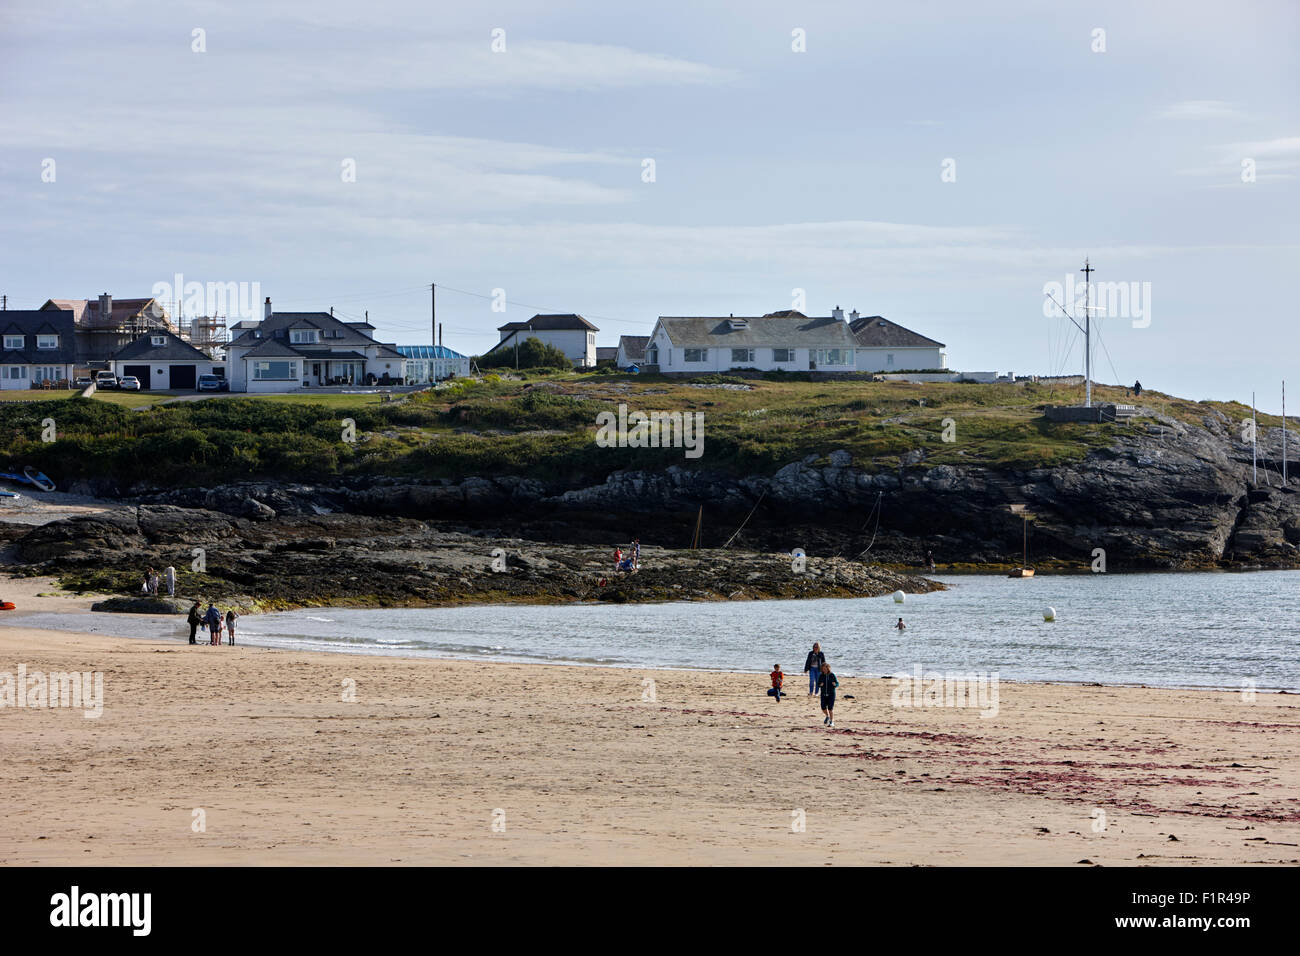 trearddur bay beach north wales uk - Stock Image